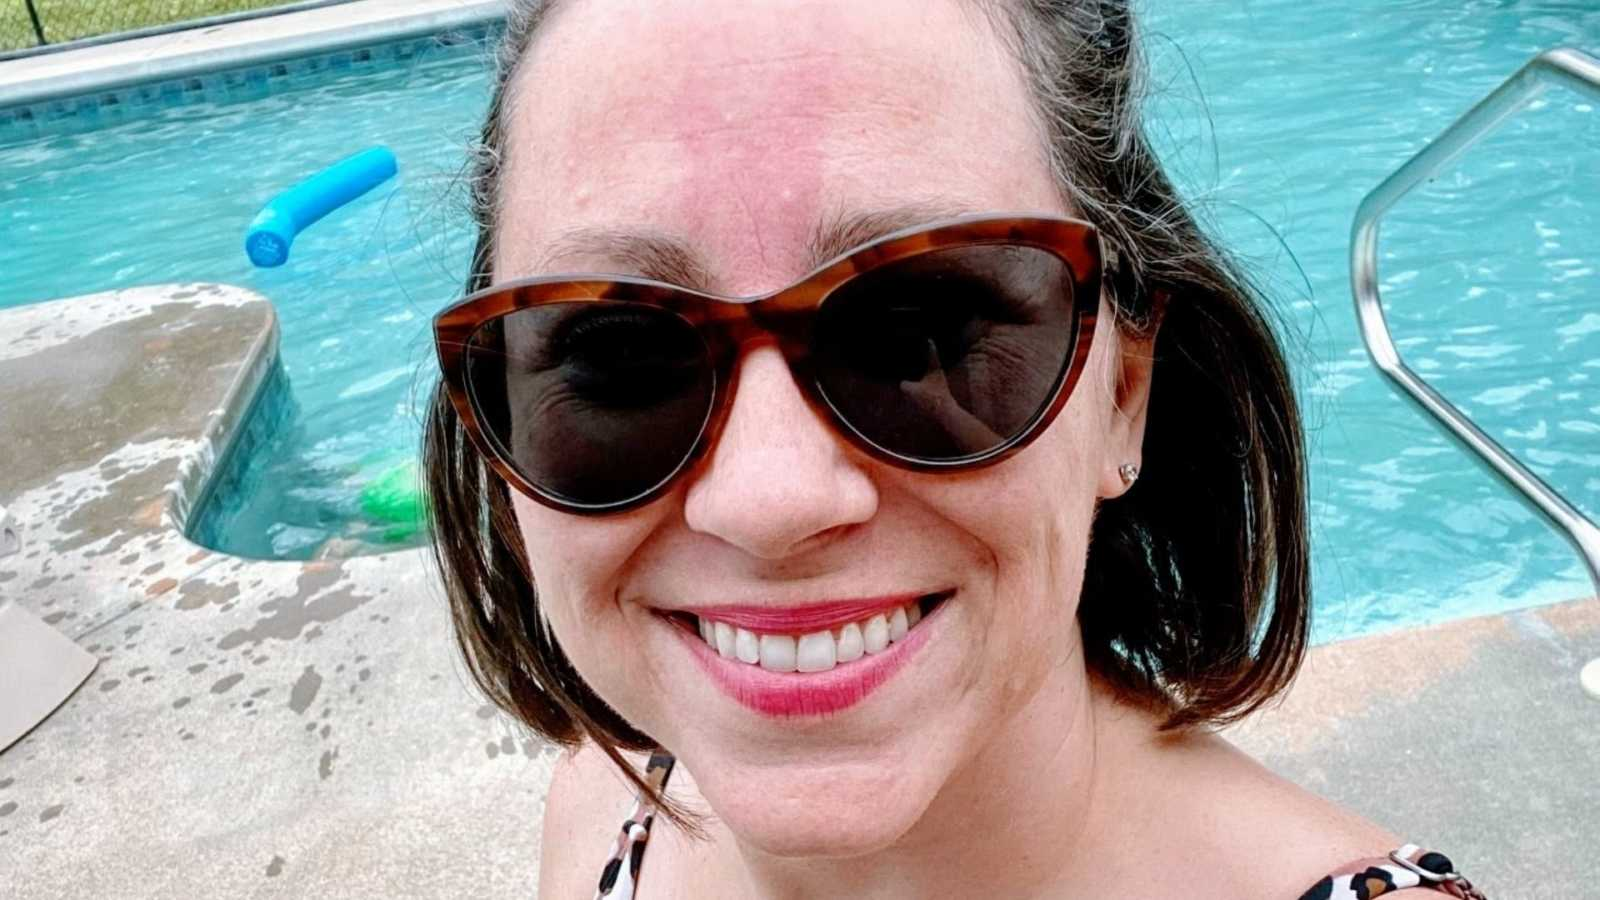 Woman in sunglasses takes a bikini selfie by the pool